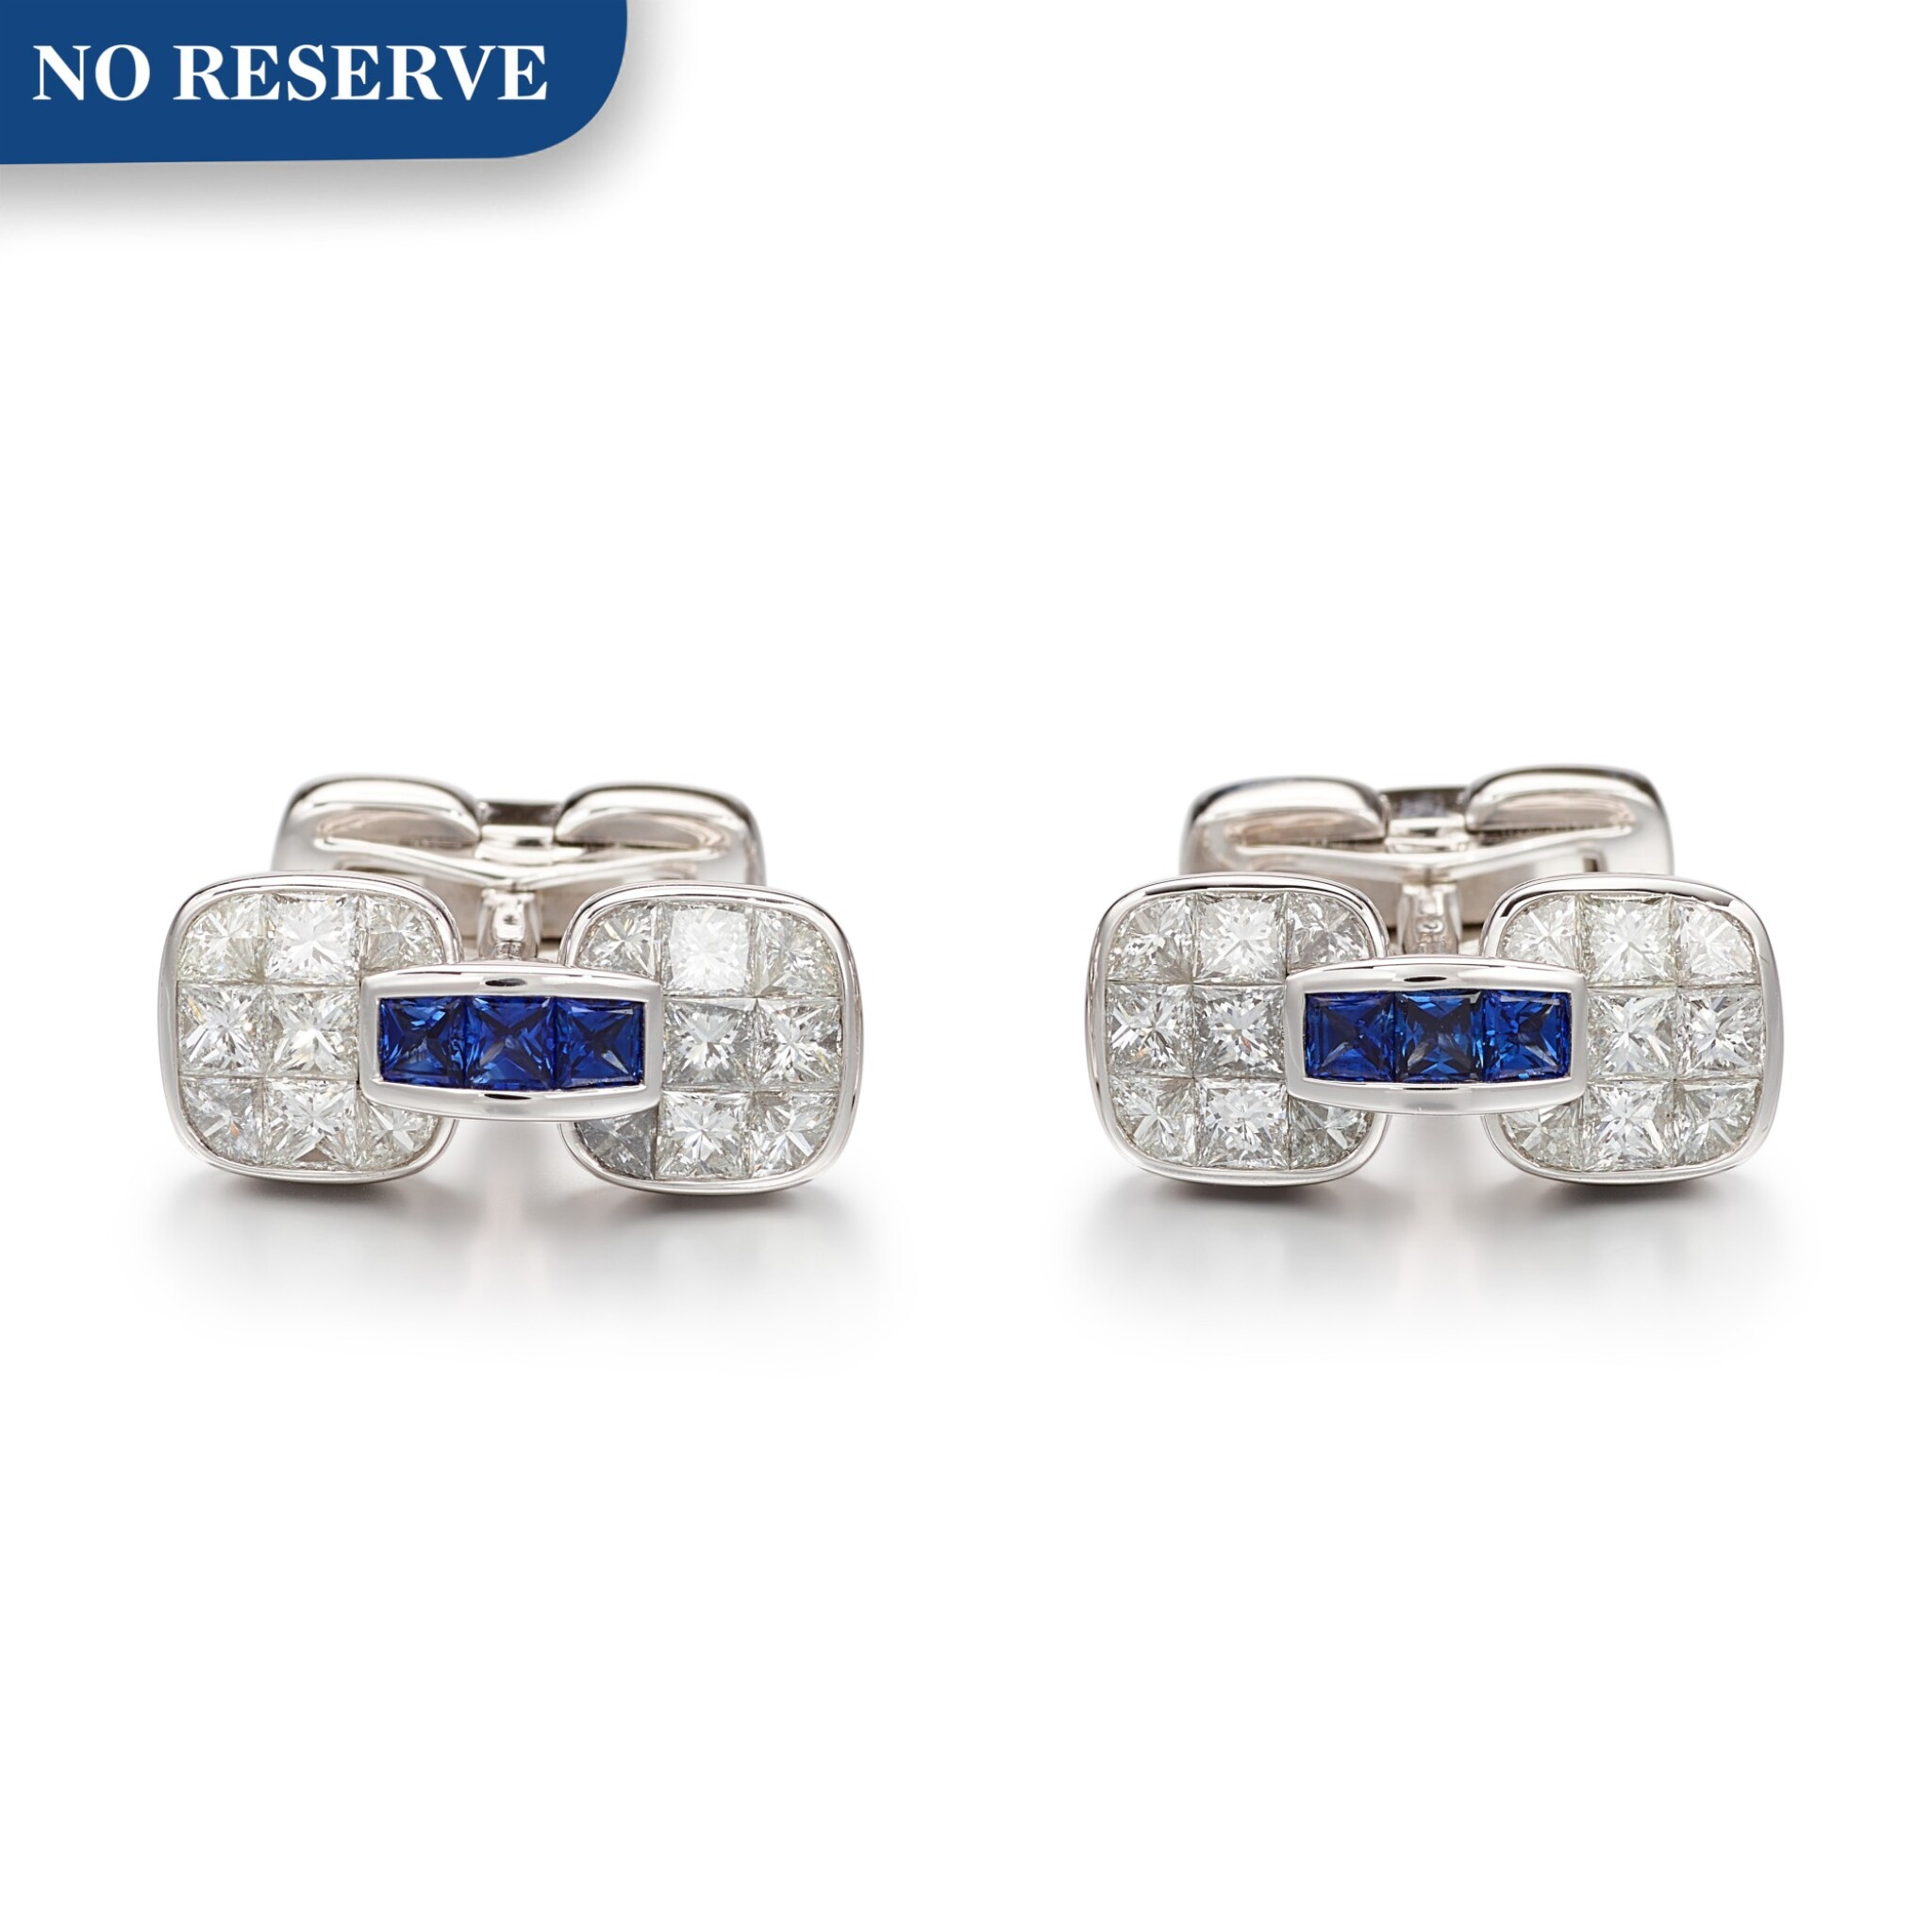 View full screen - View 1 of Lot 1106. Pair of Sapphire and Diamond Cufflinks   格拉夫  藍寶石 配 鑽石 袖扣一對 (藍寶石及鑽石共重約1.10及3.30克拉).